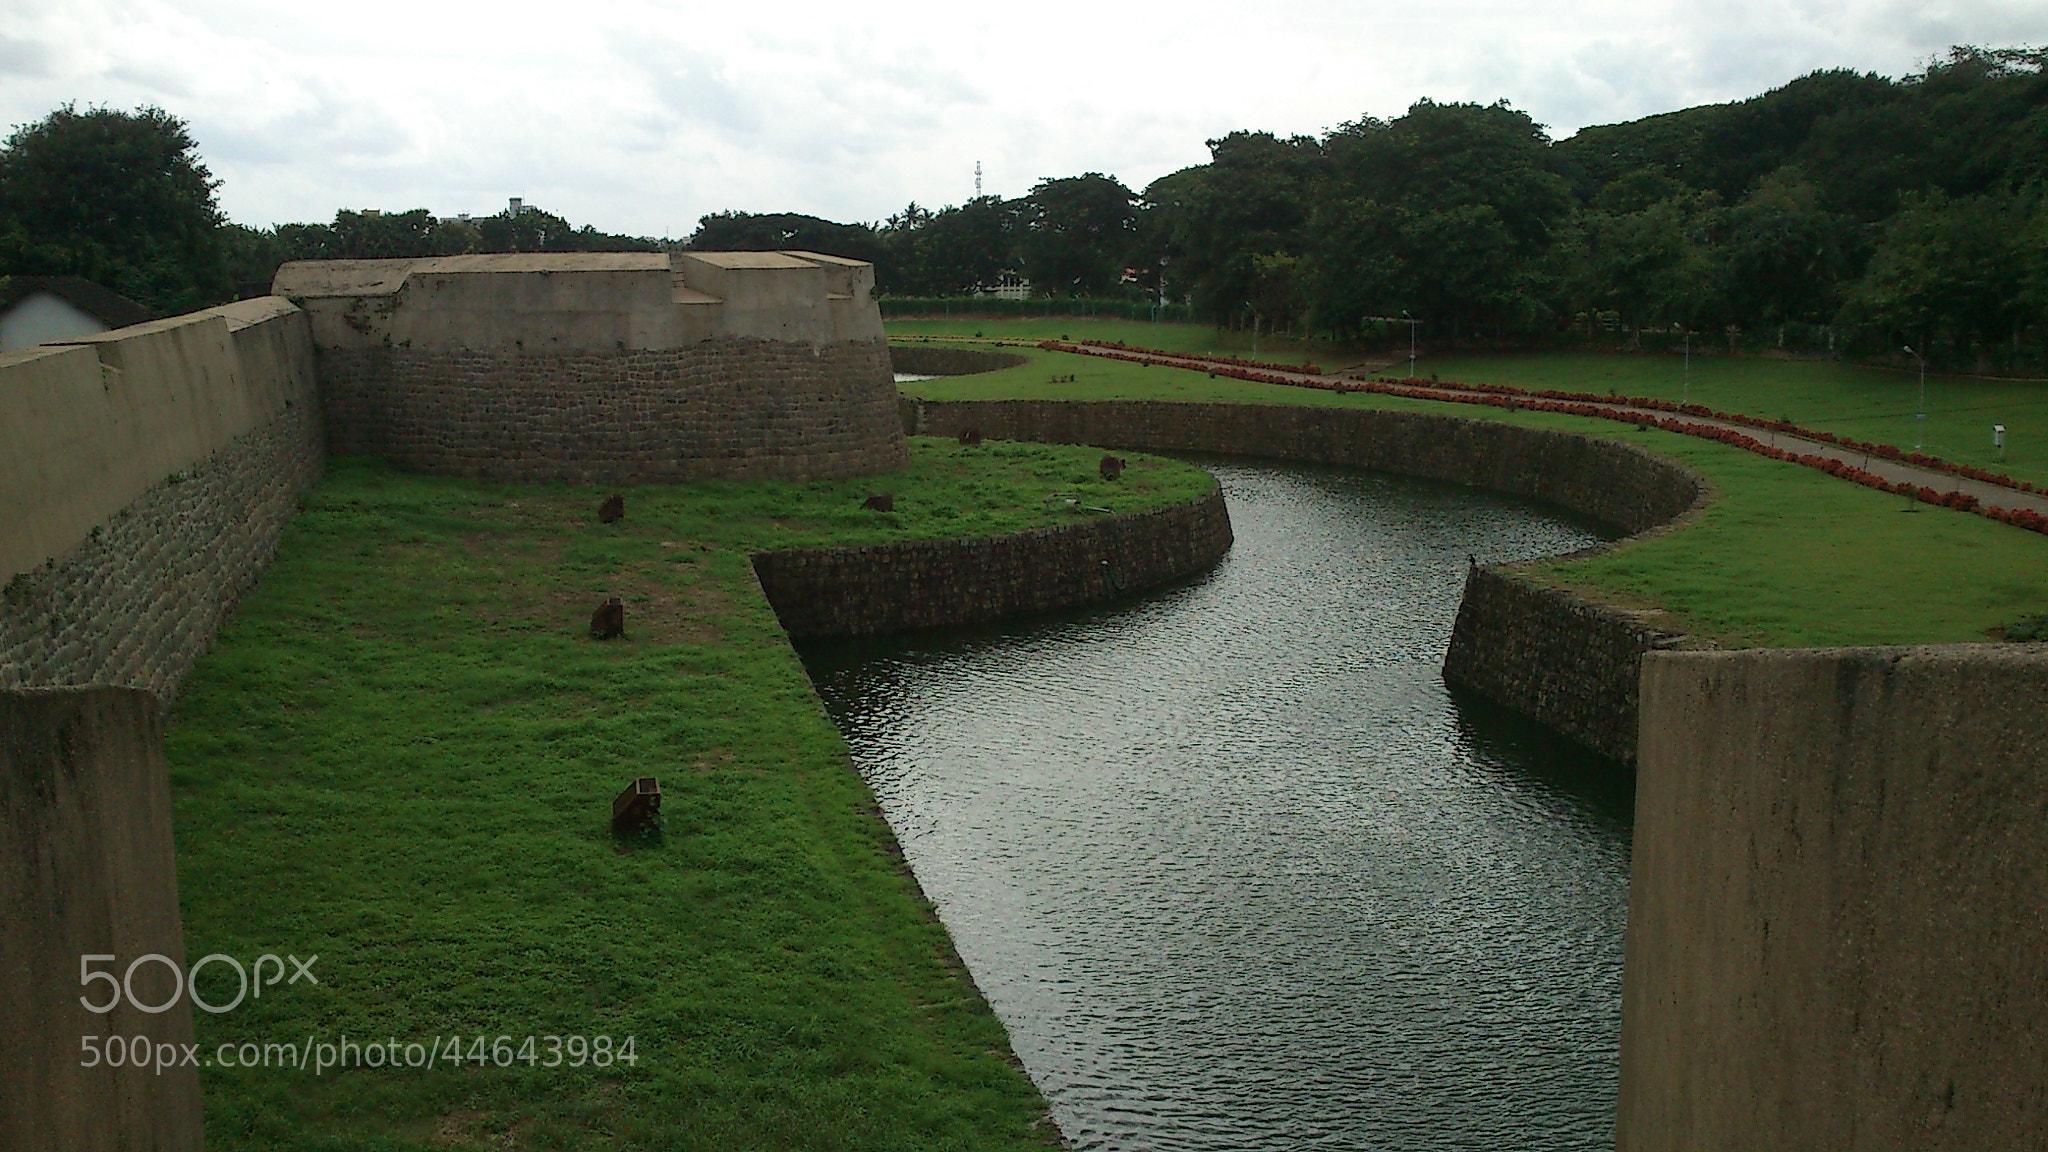 Photograph Palakkad Tipu's Fort by Abdul Hakkim on 500px